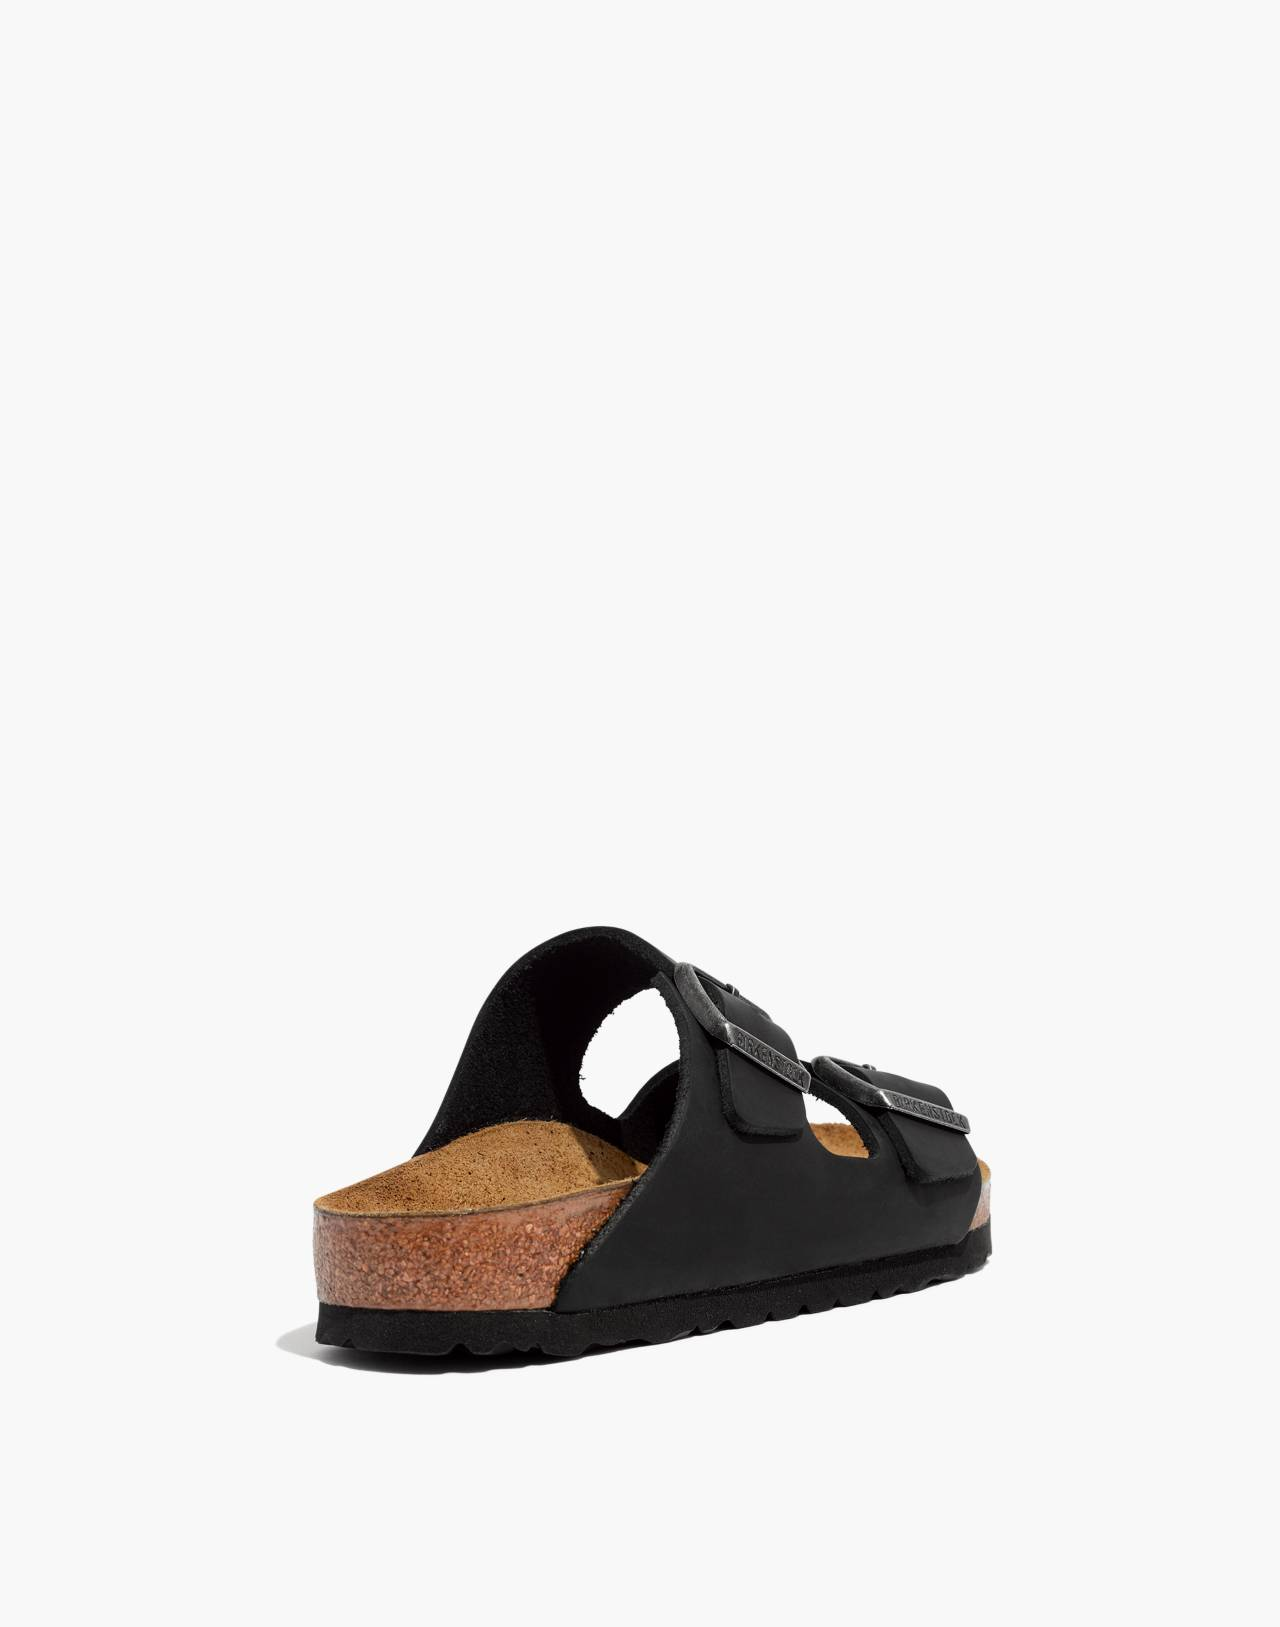 Birkenstock® Arizona Sandals in Black Leather in true black image 4